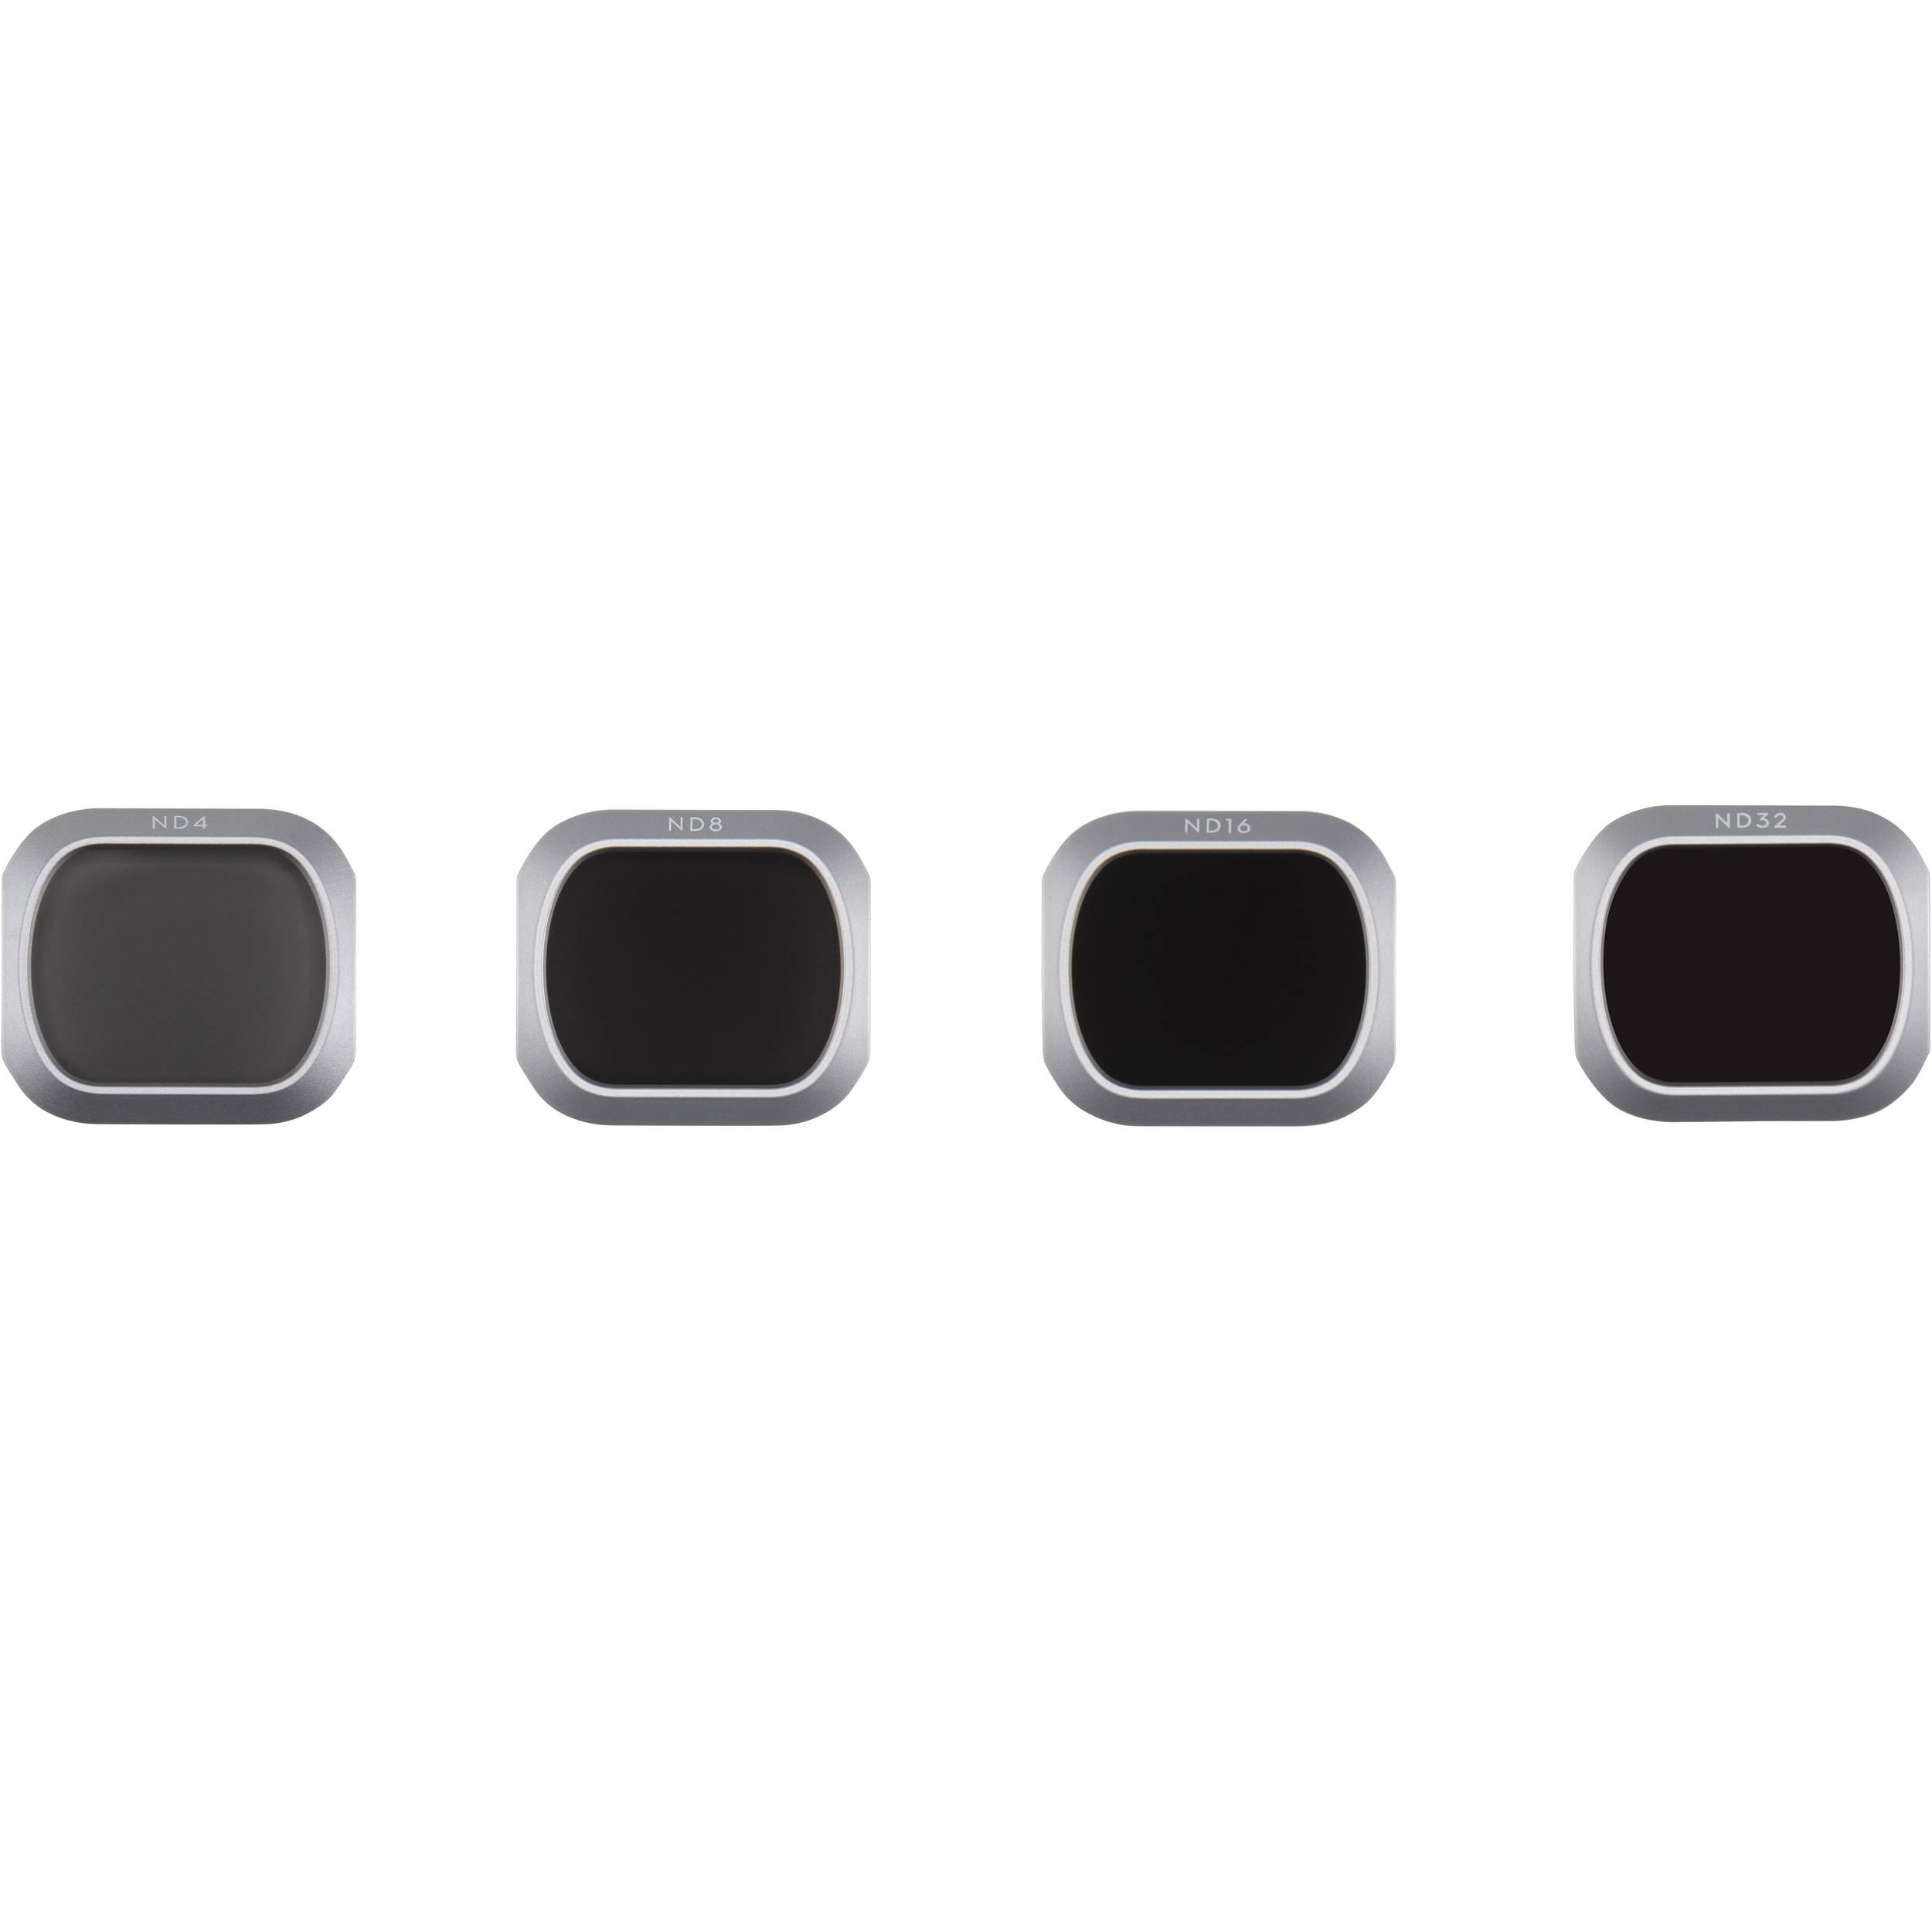 a0d4ce3966a DJI ND Filter Set for Mavic 2 Pro (4-Pack) CP.MA.00000063.01 B&H